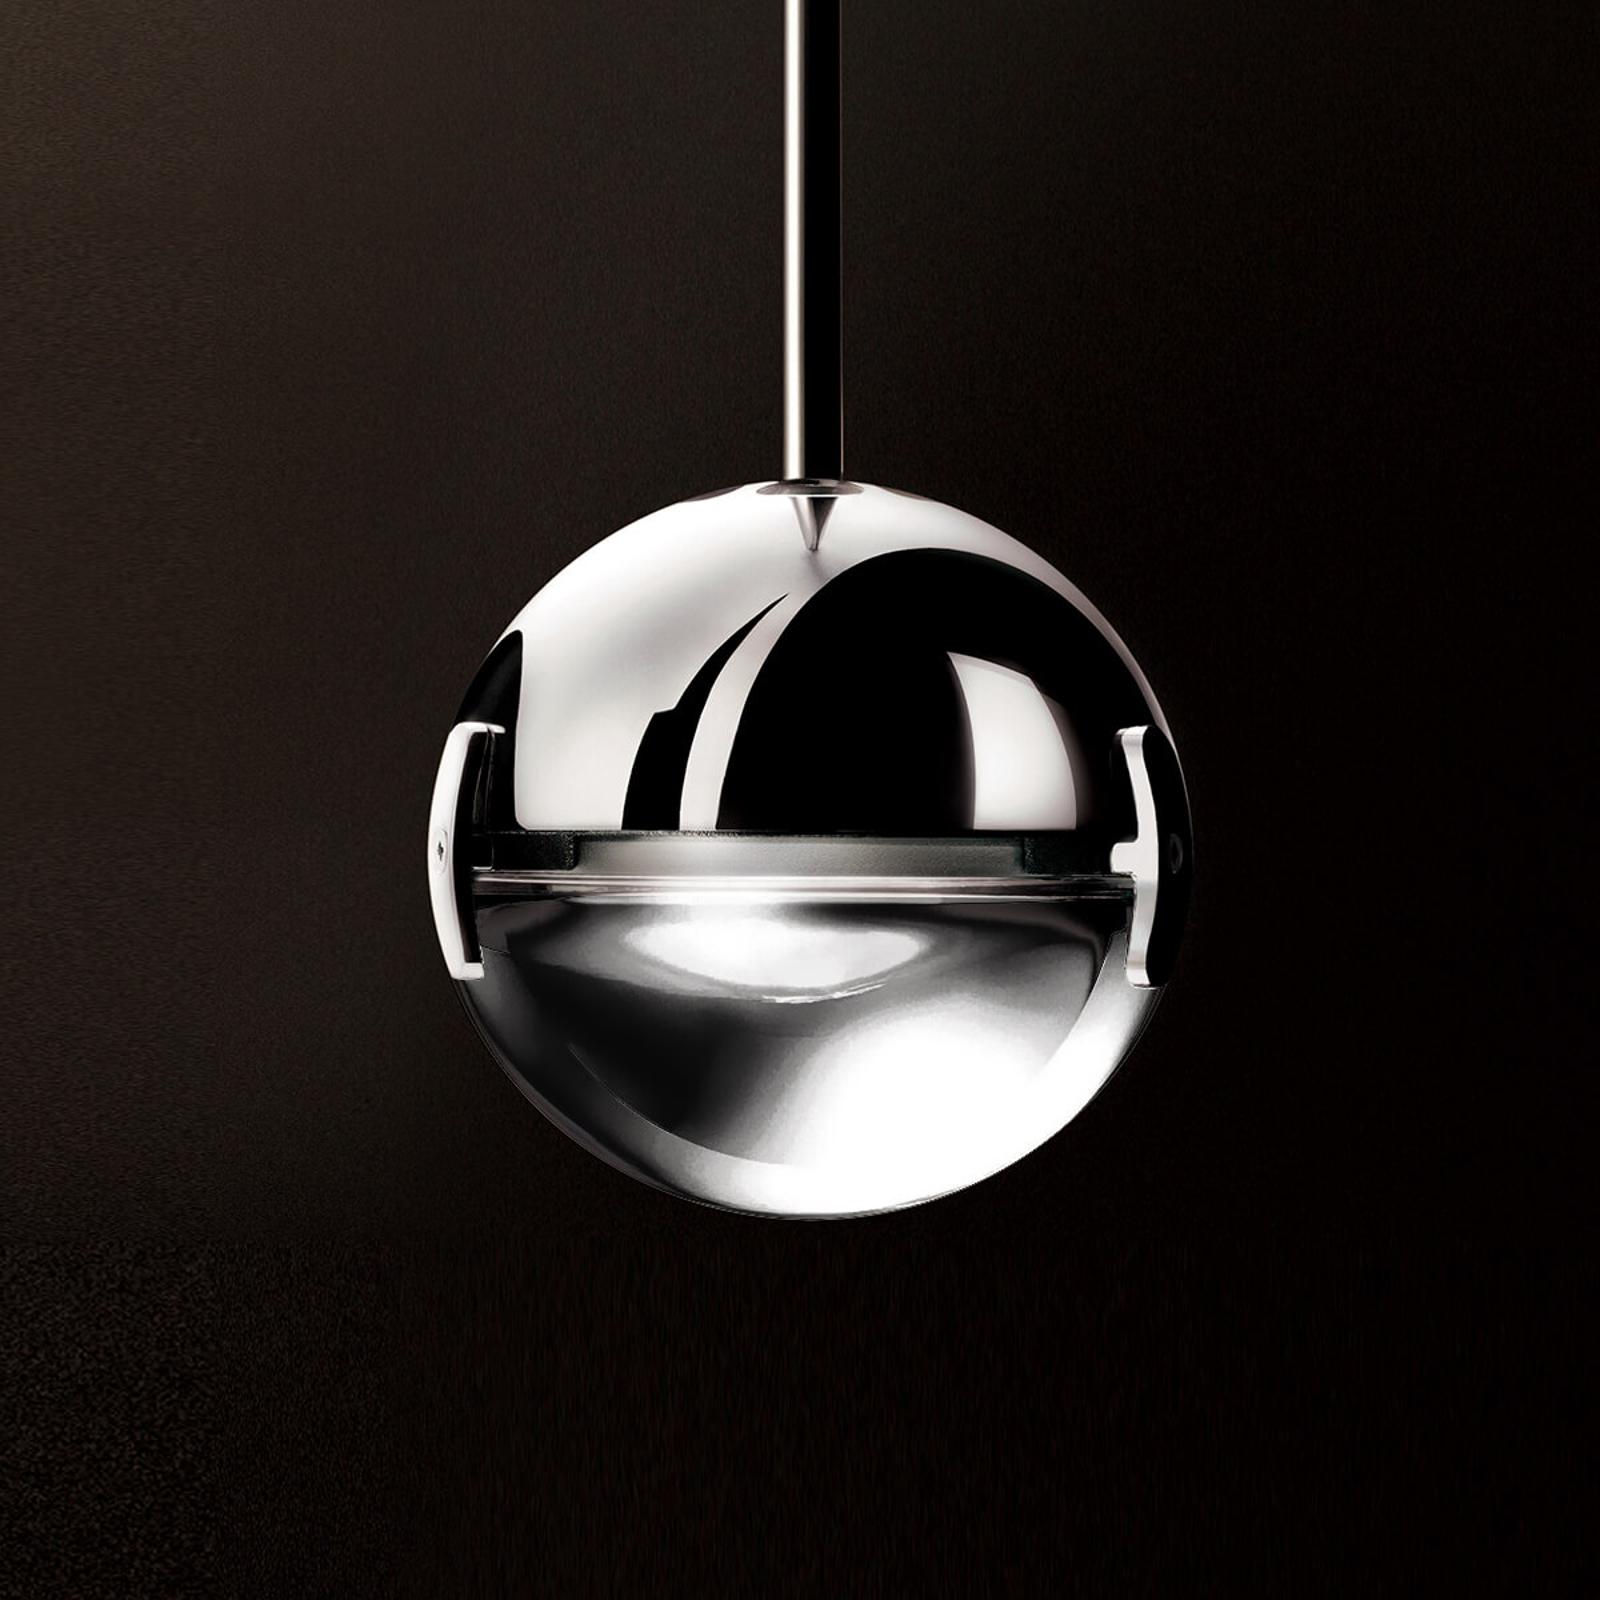 Cini&Nils Convivio - LED-Hängelampe, chrom, klar